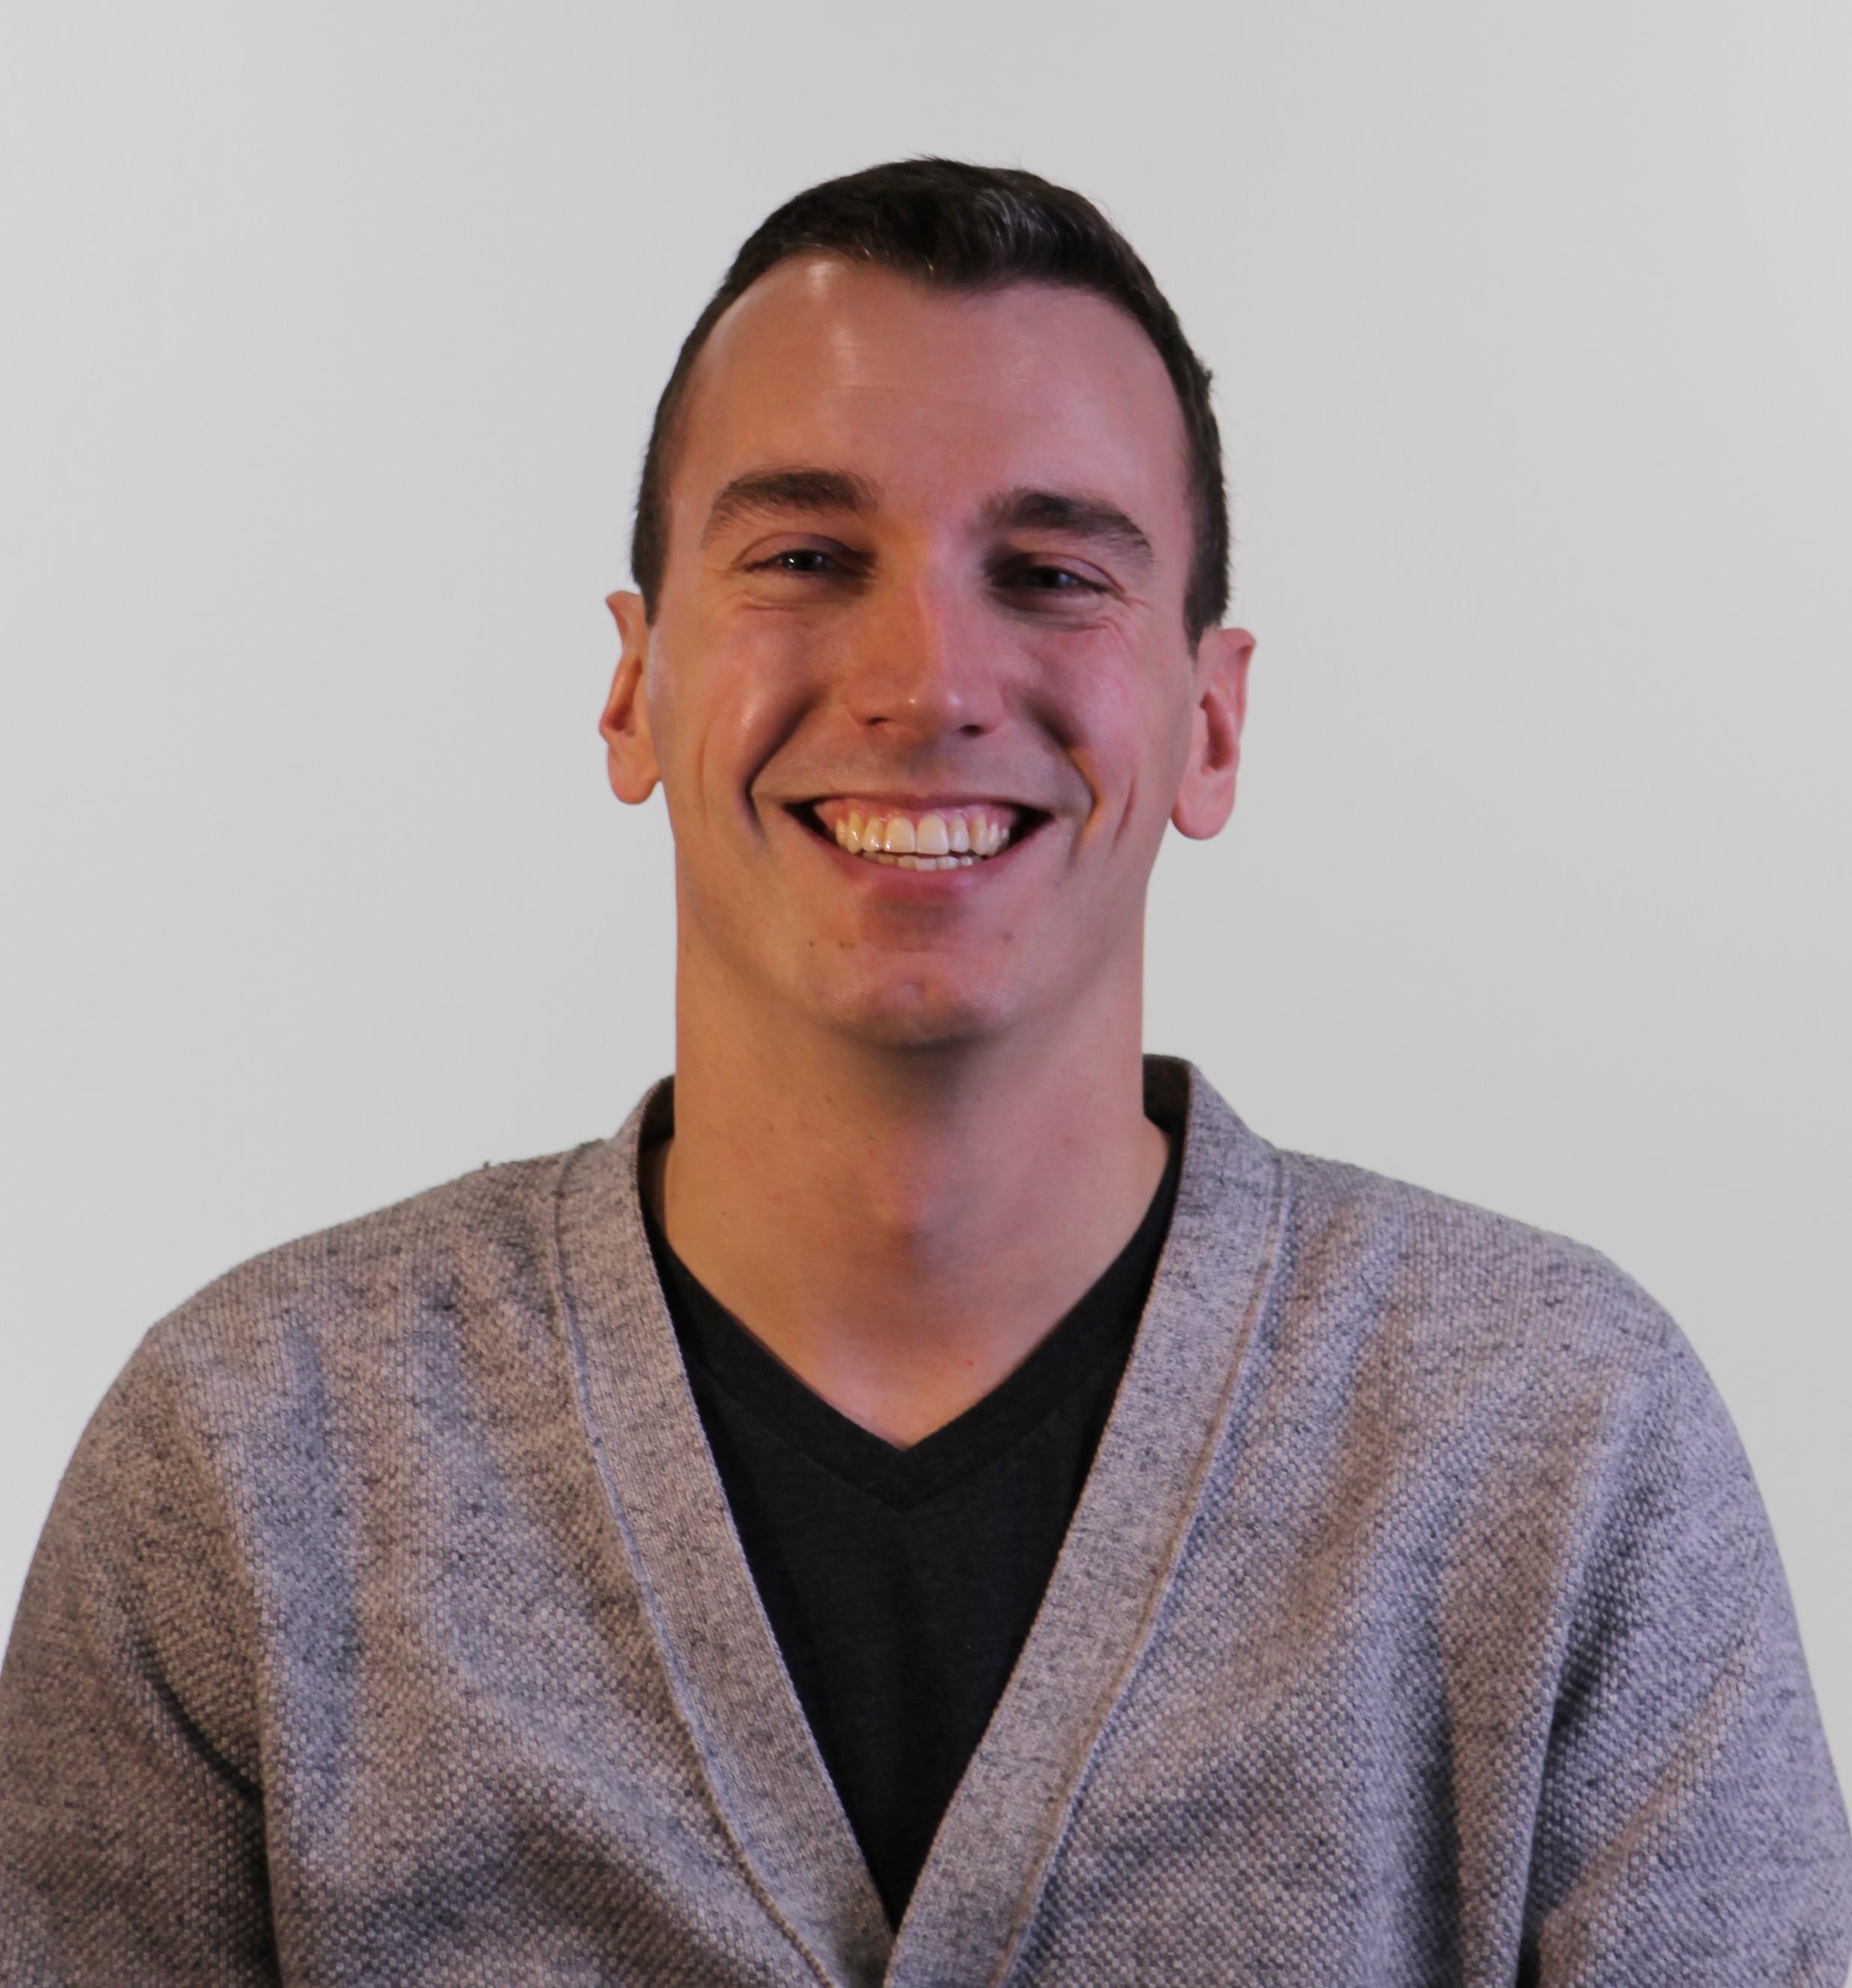 Nick Vance Social Media Lab, Technology Services University of Illinois